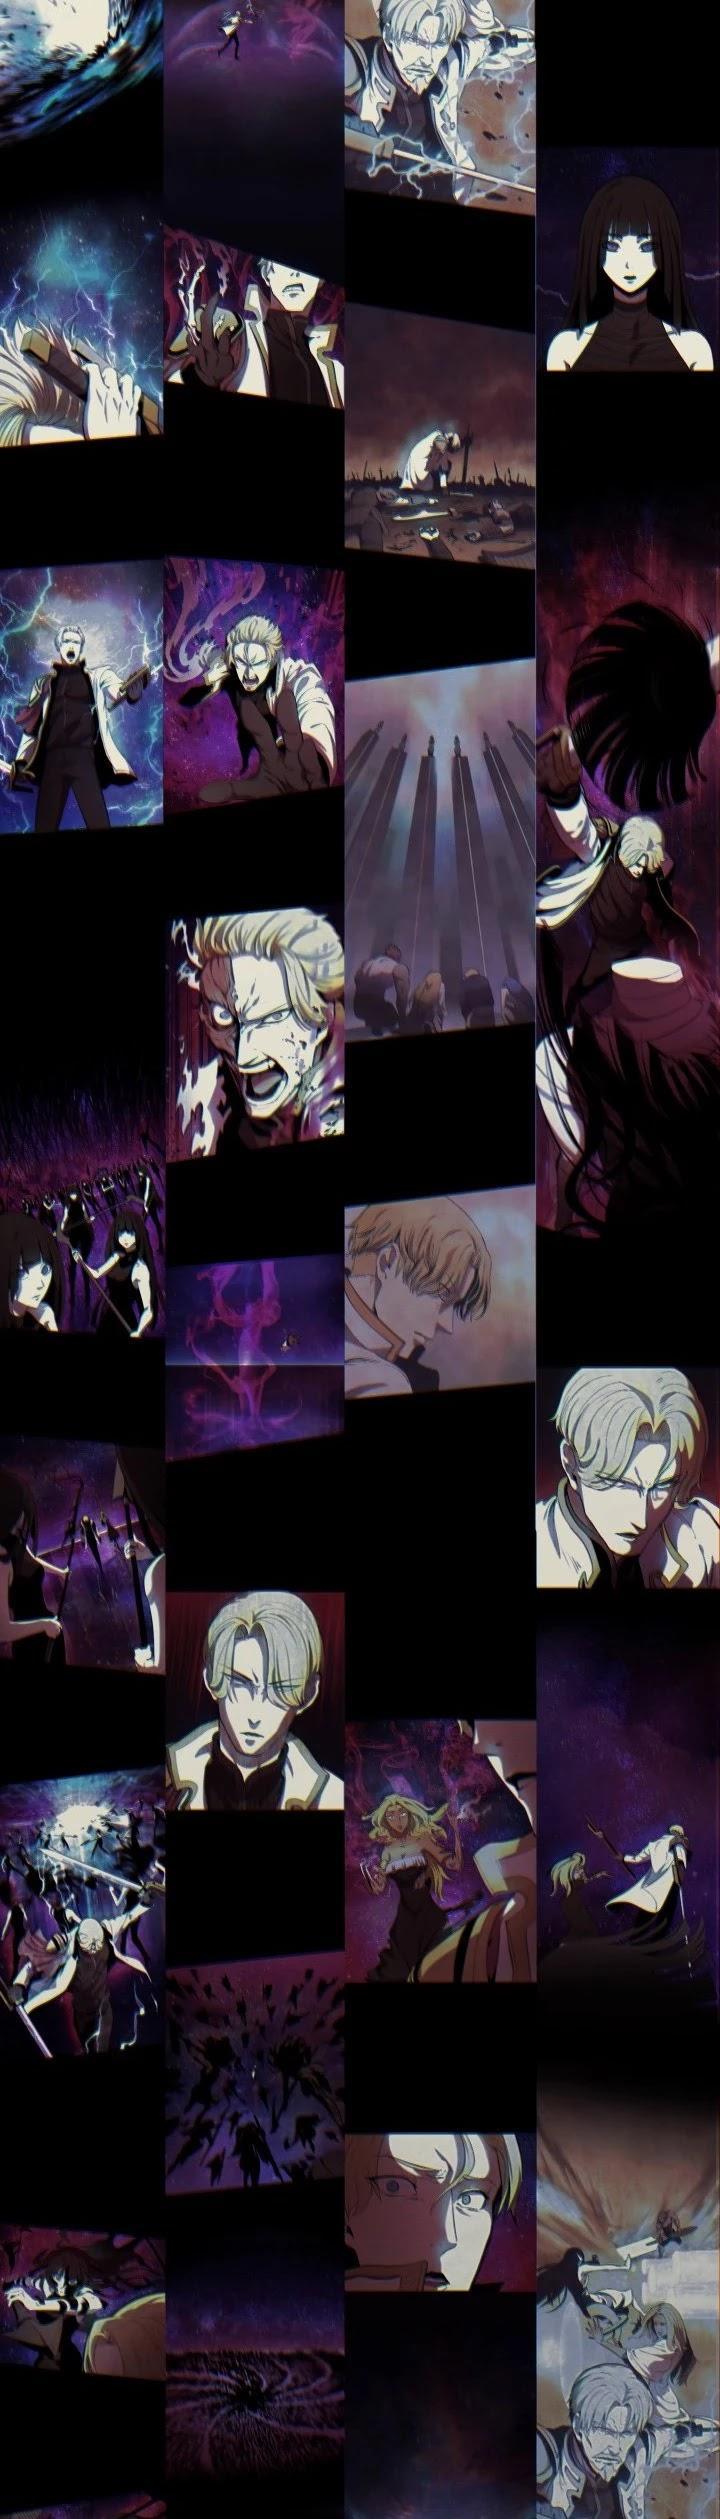 Survival Story Of A Sword King In A Fantasy World Chapter 50: End Season 1 page 41 - Mangakakalots.com